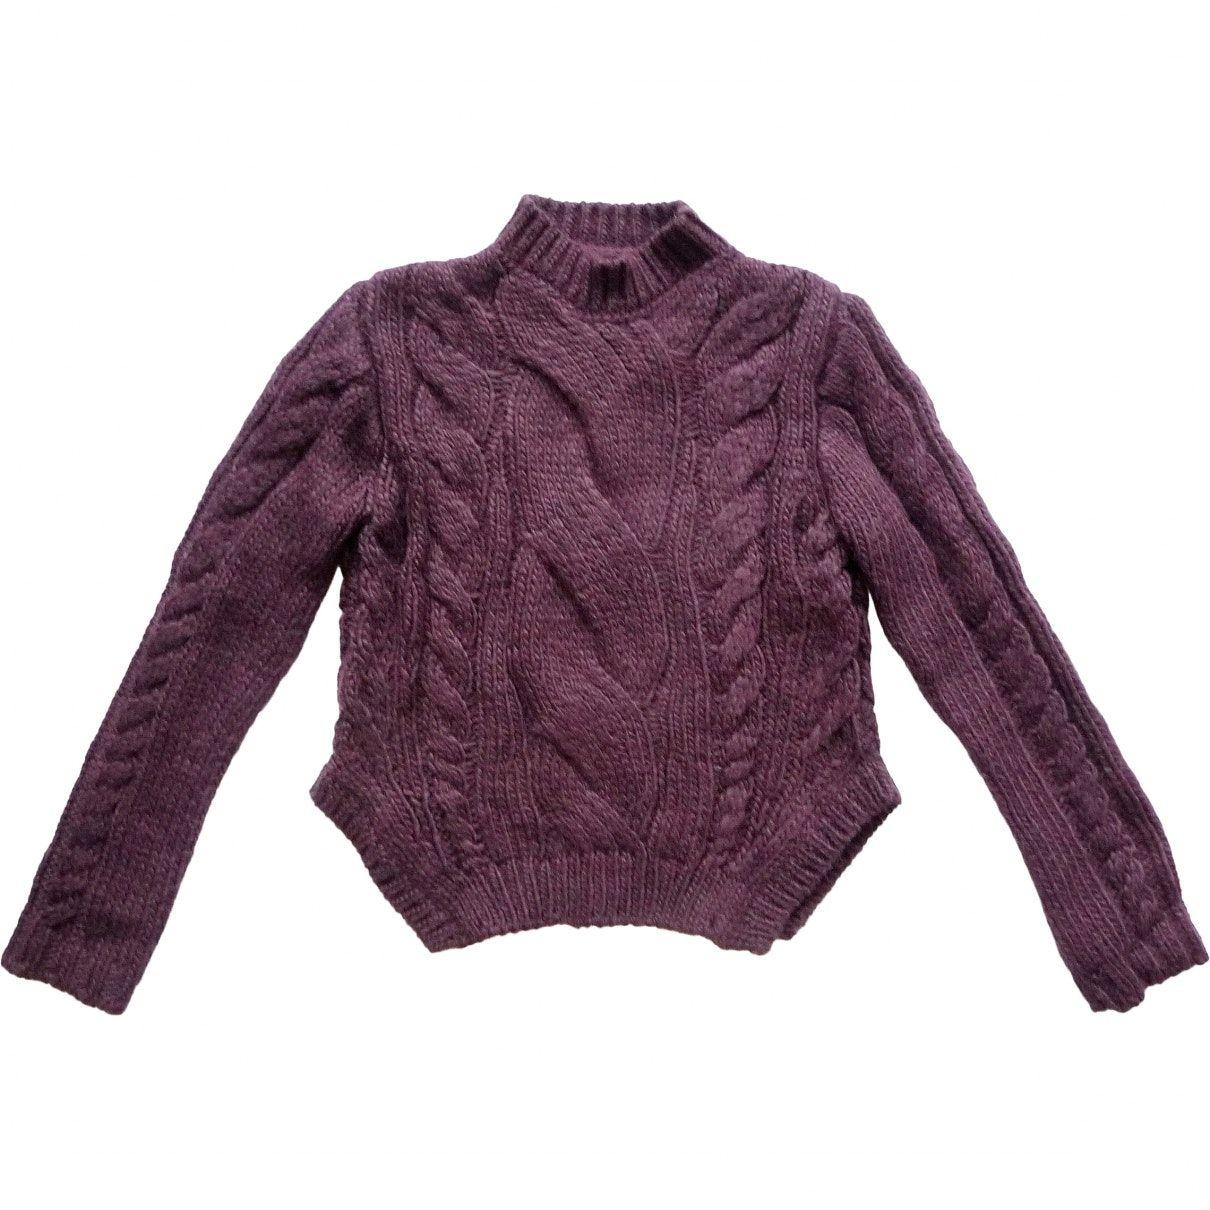 Pullover en laine in 2019 Fashion, Aubergine colour